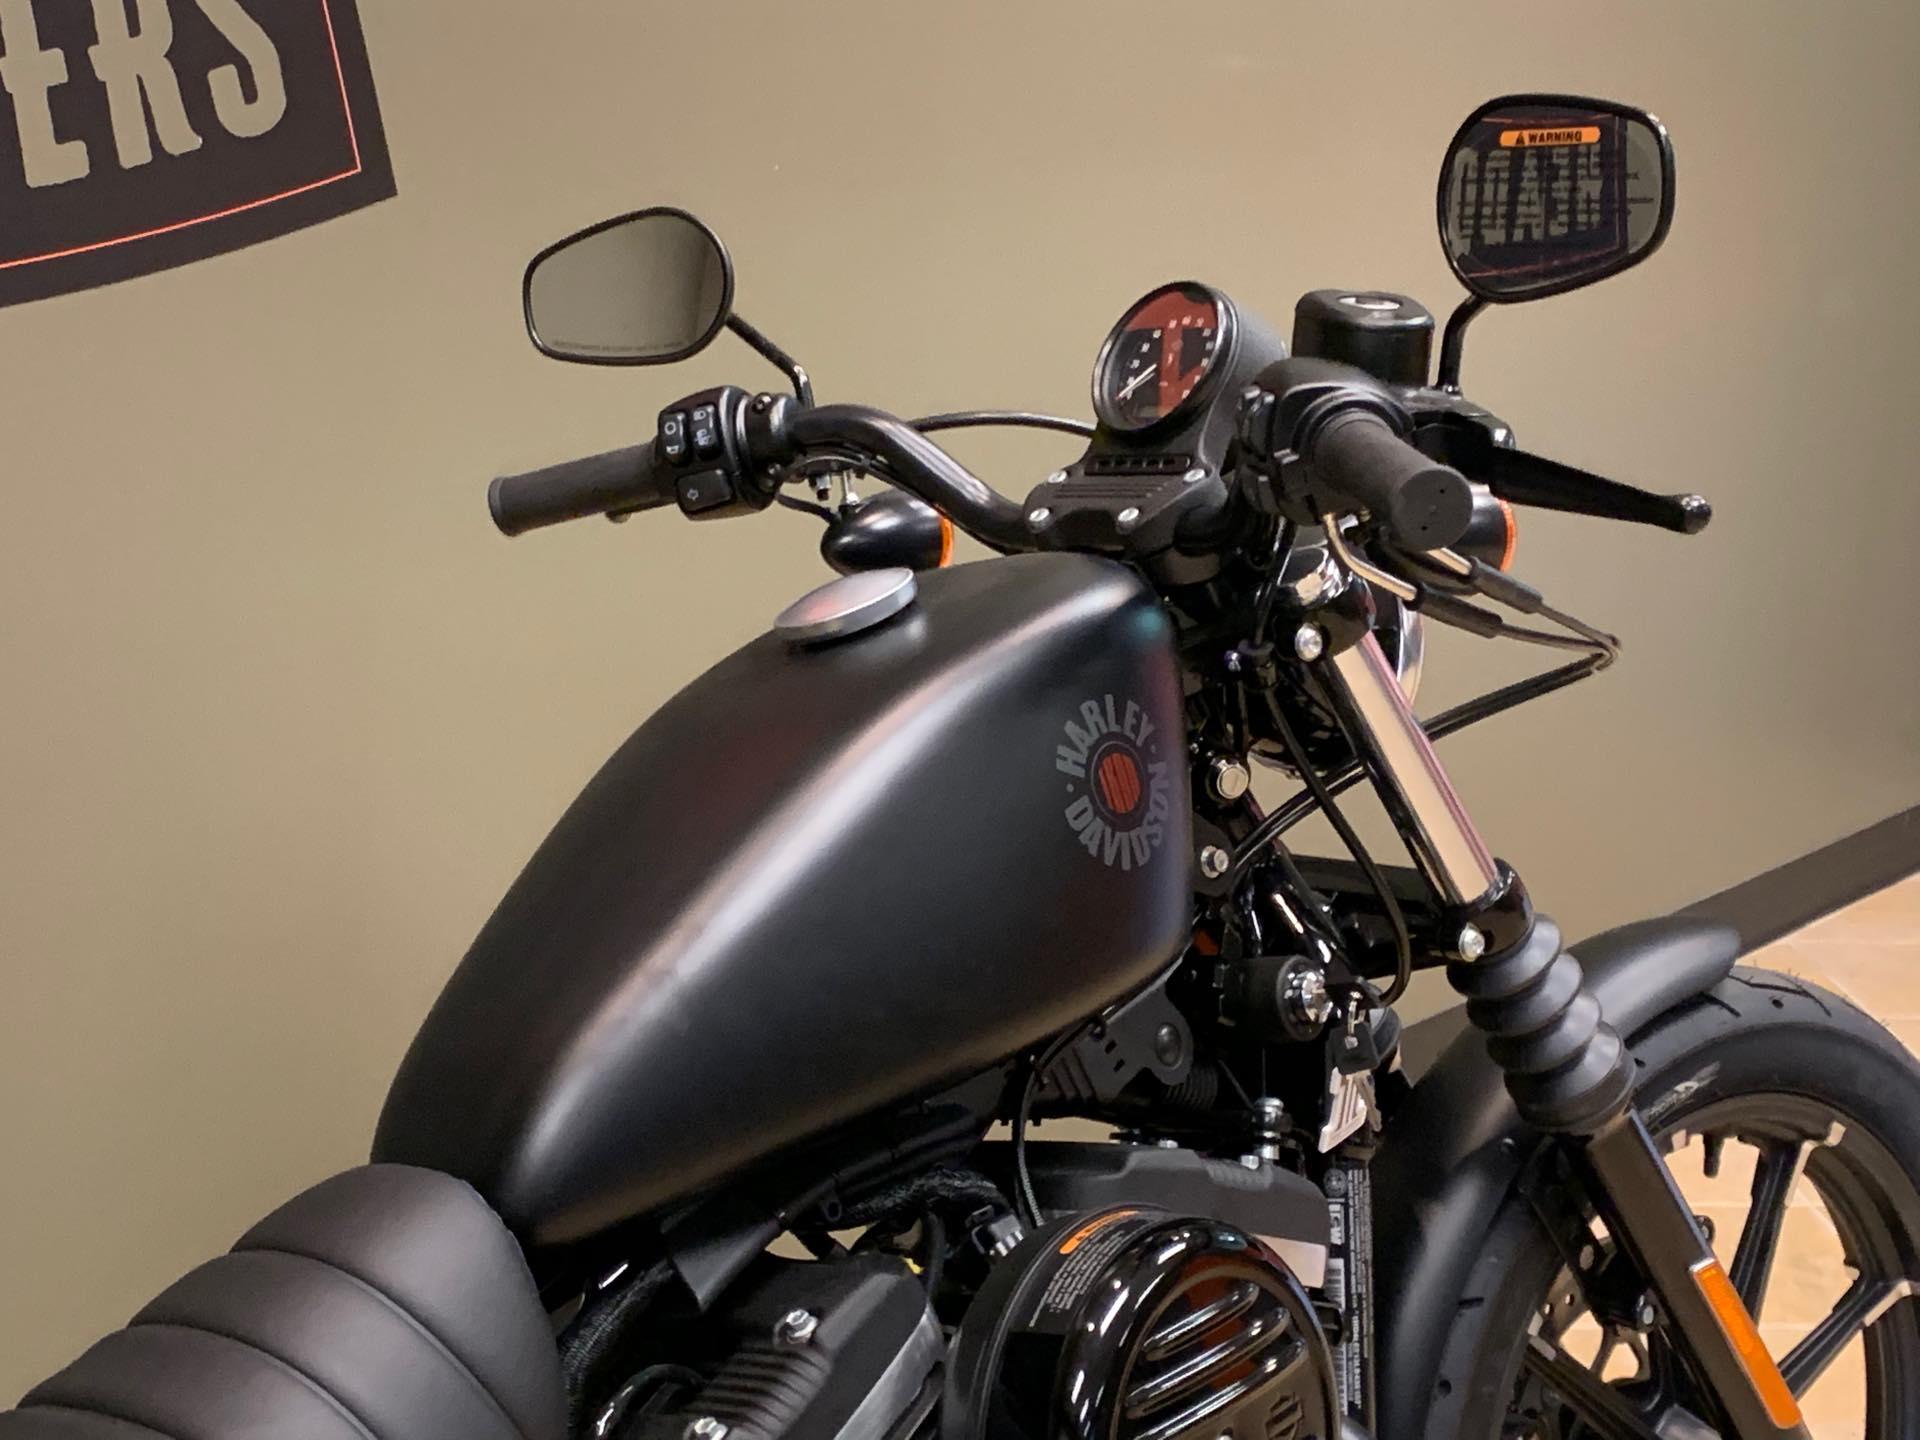 2020 Harley-Davidson Sportster Iron 883 at Loess Hills Harley-Davidson